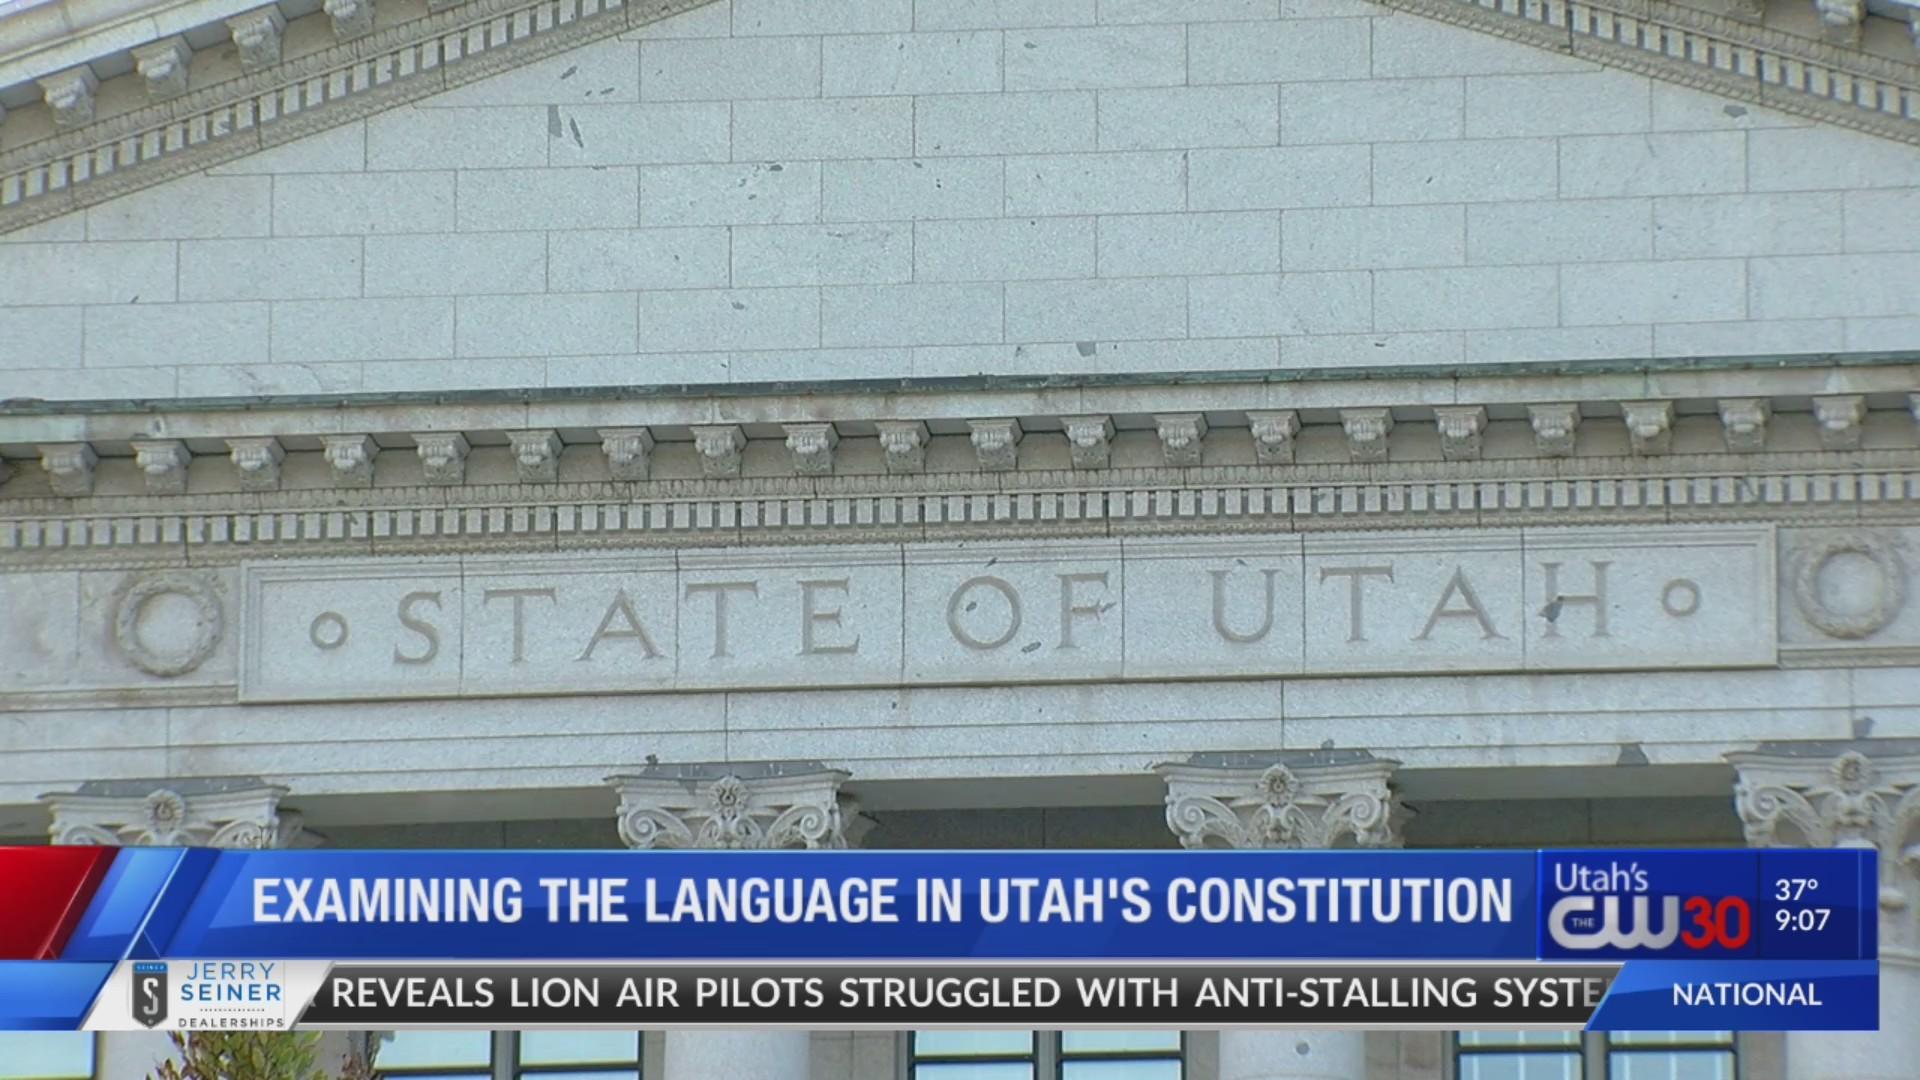 Slavery in Utah's Constitution explained